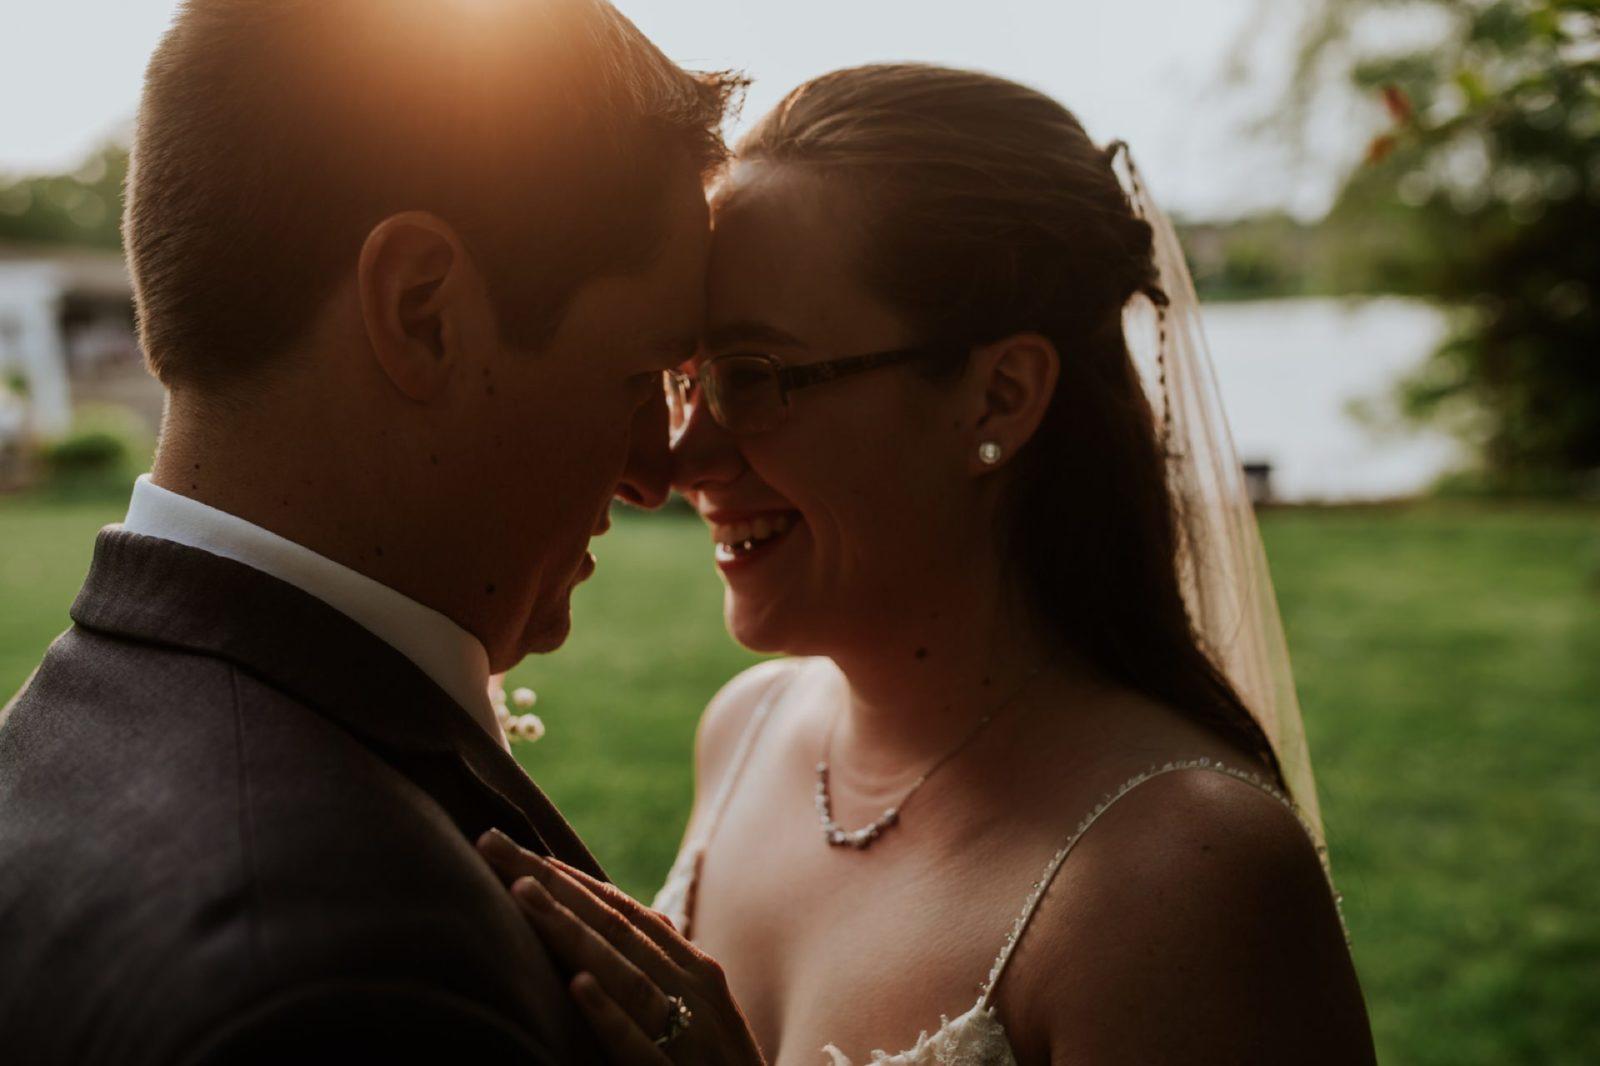 charming-willows-wedding_044-1600x1066.jpg